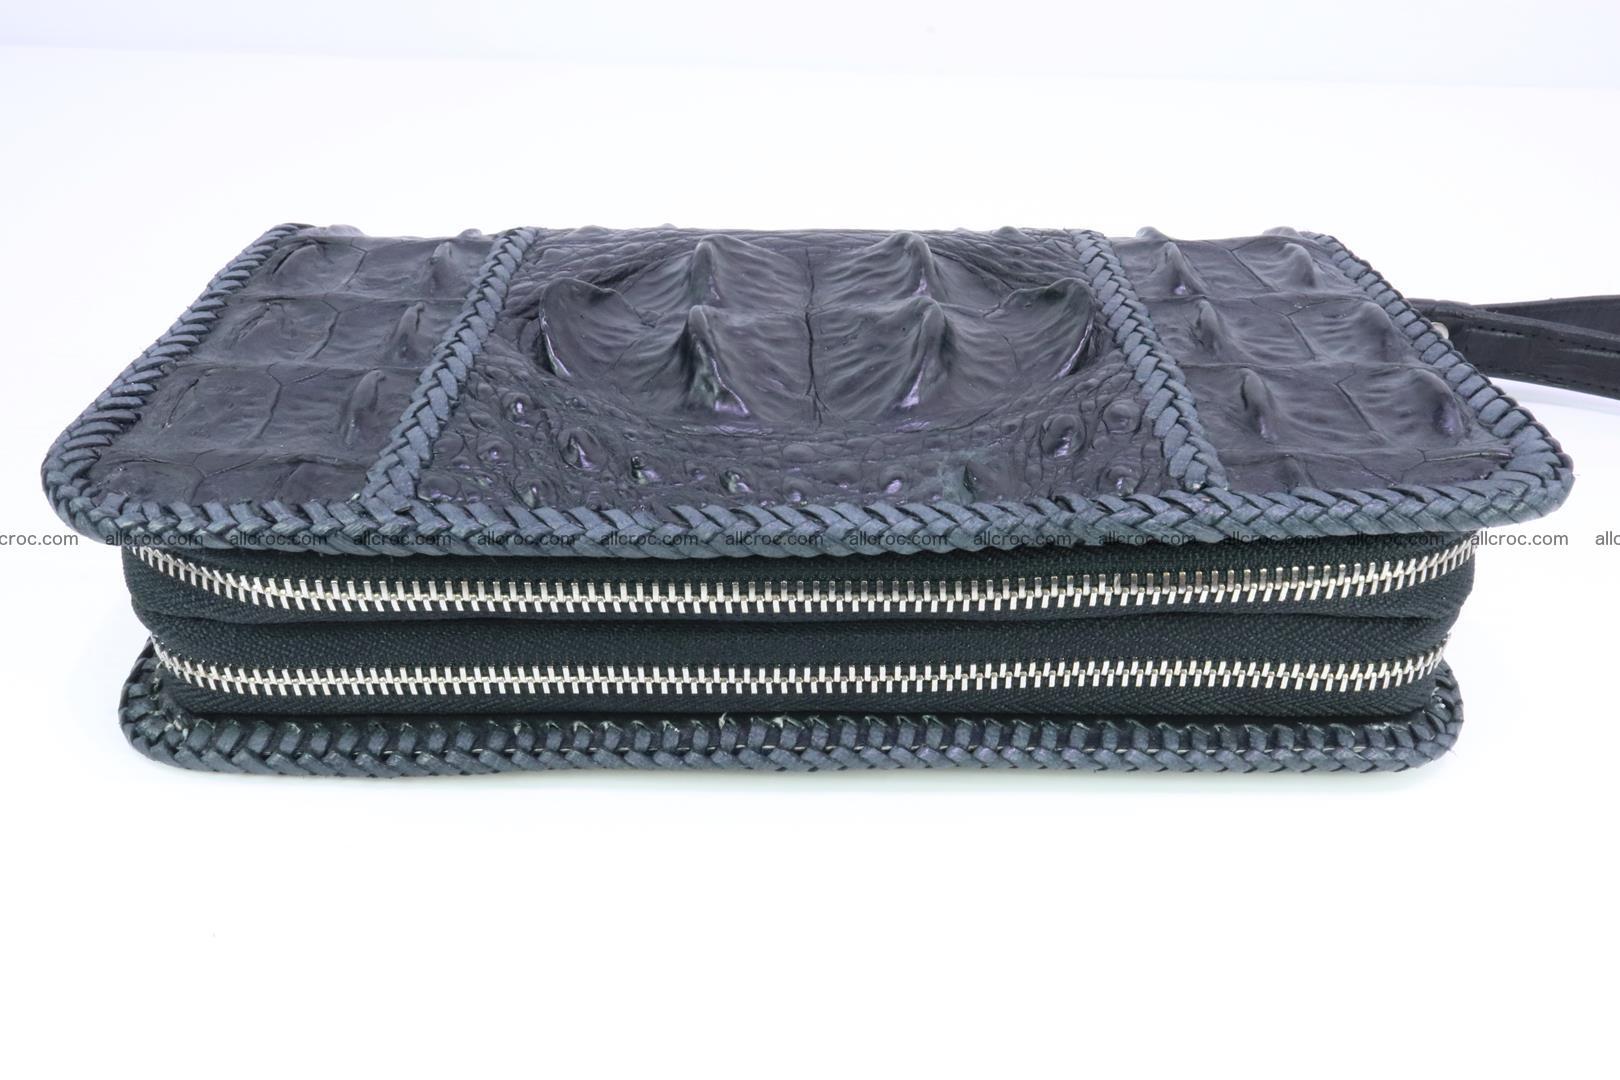 Crocodile clutch for men from genuine hornback crocodile leather 160 Foto 2